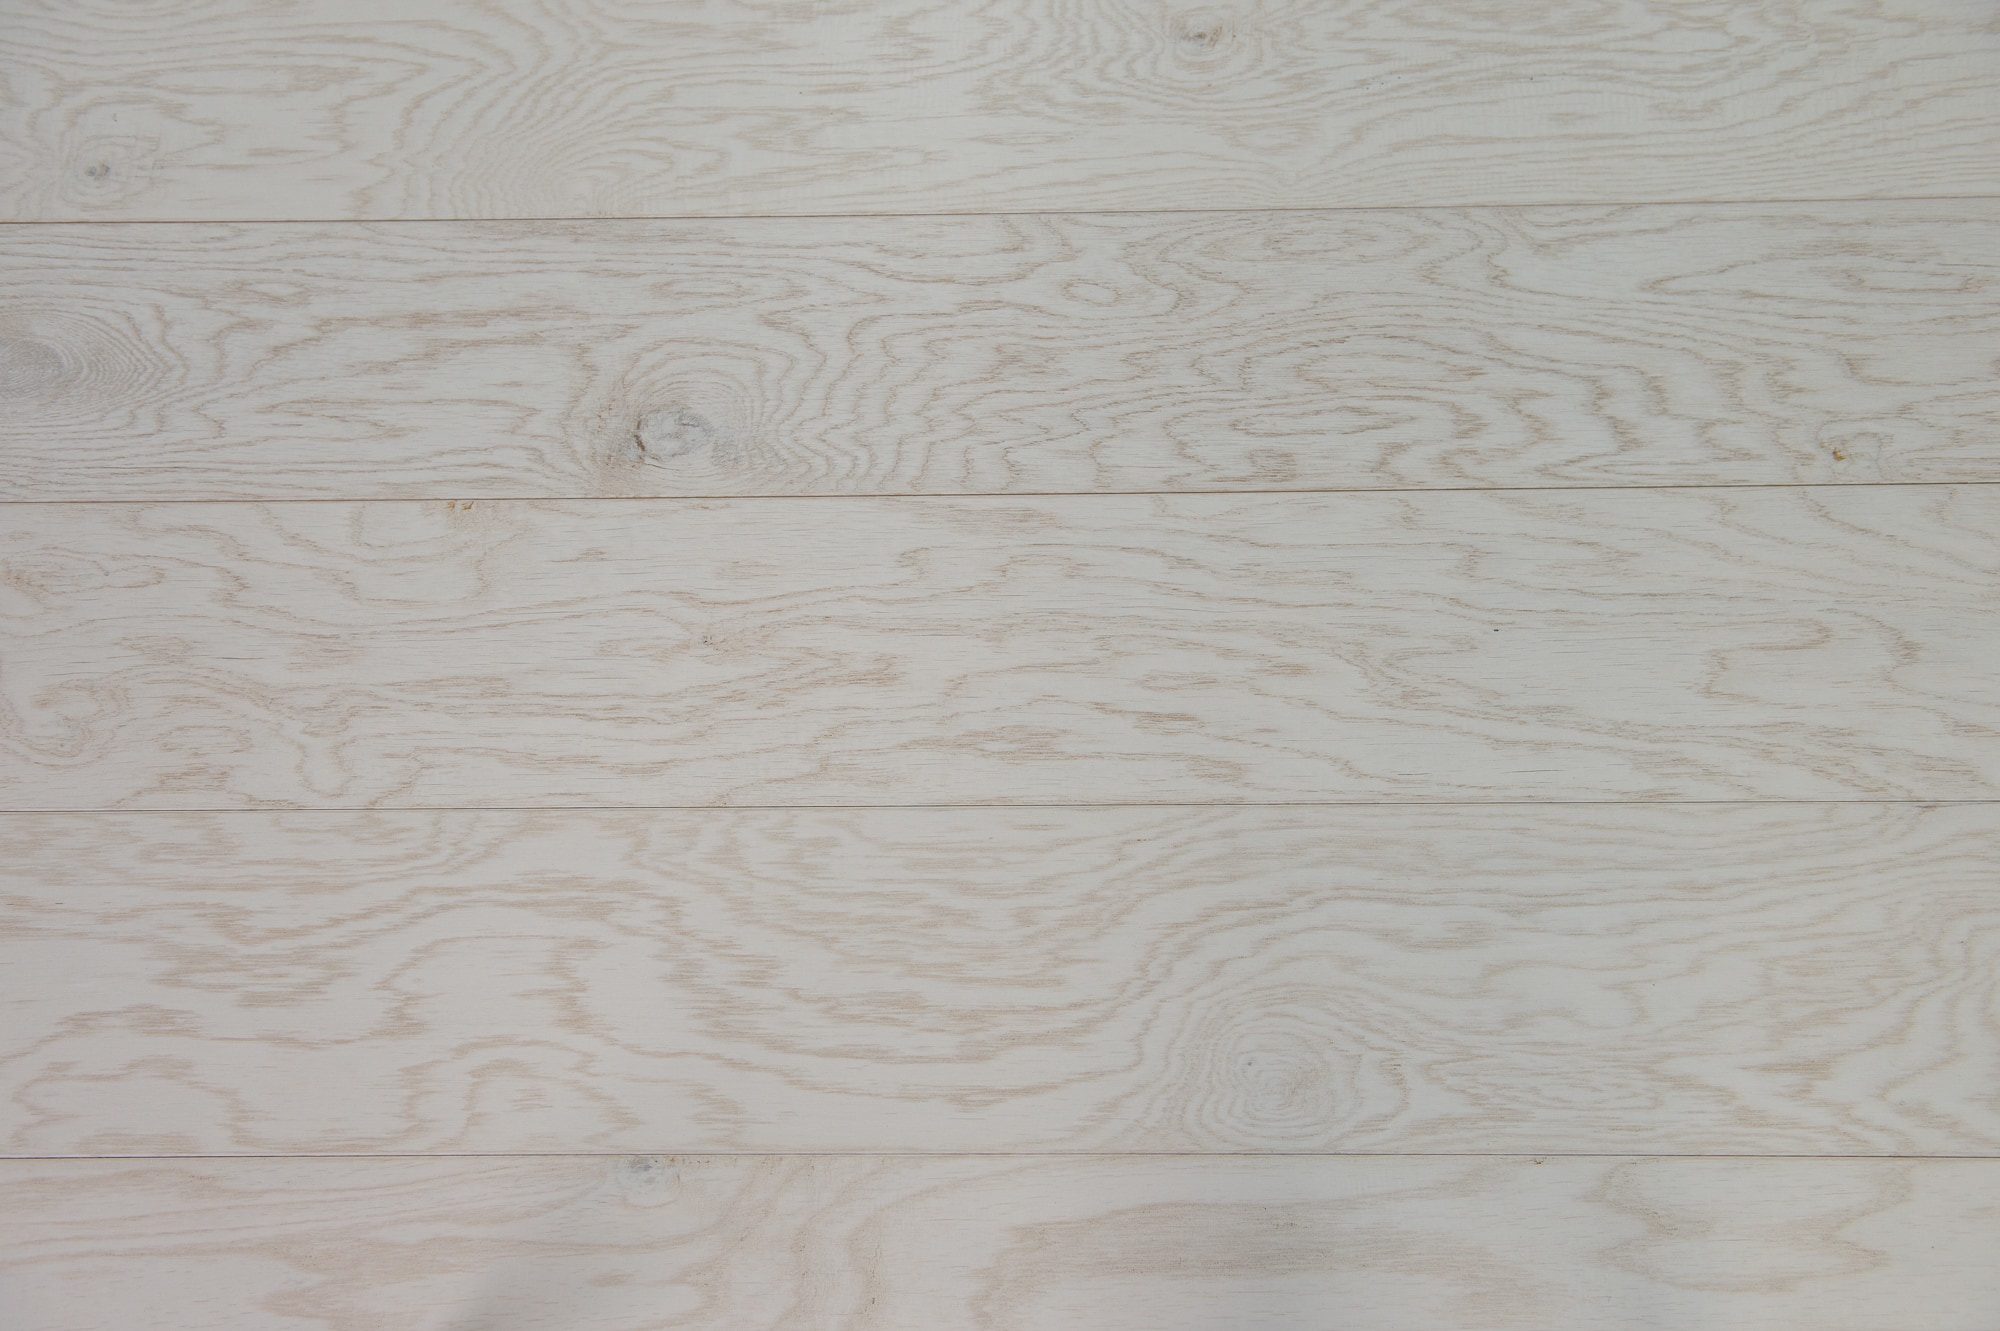 Coconut / White Oak / Urethane / Rustic/Character Grade / Sample Engineered Hardwood - Oak - Arapaho Collection 0